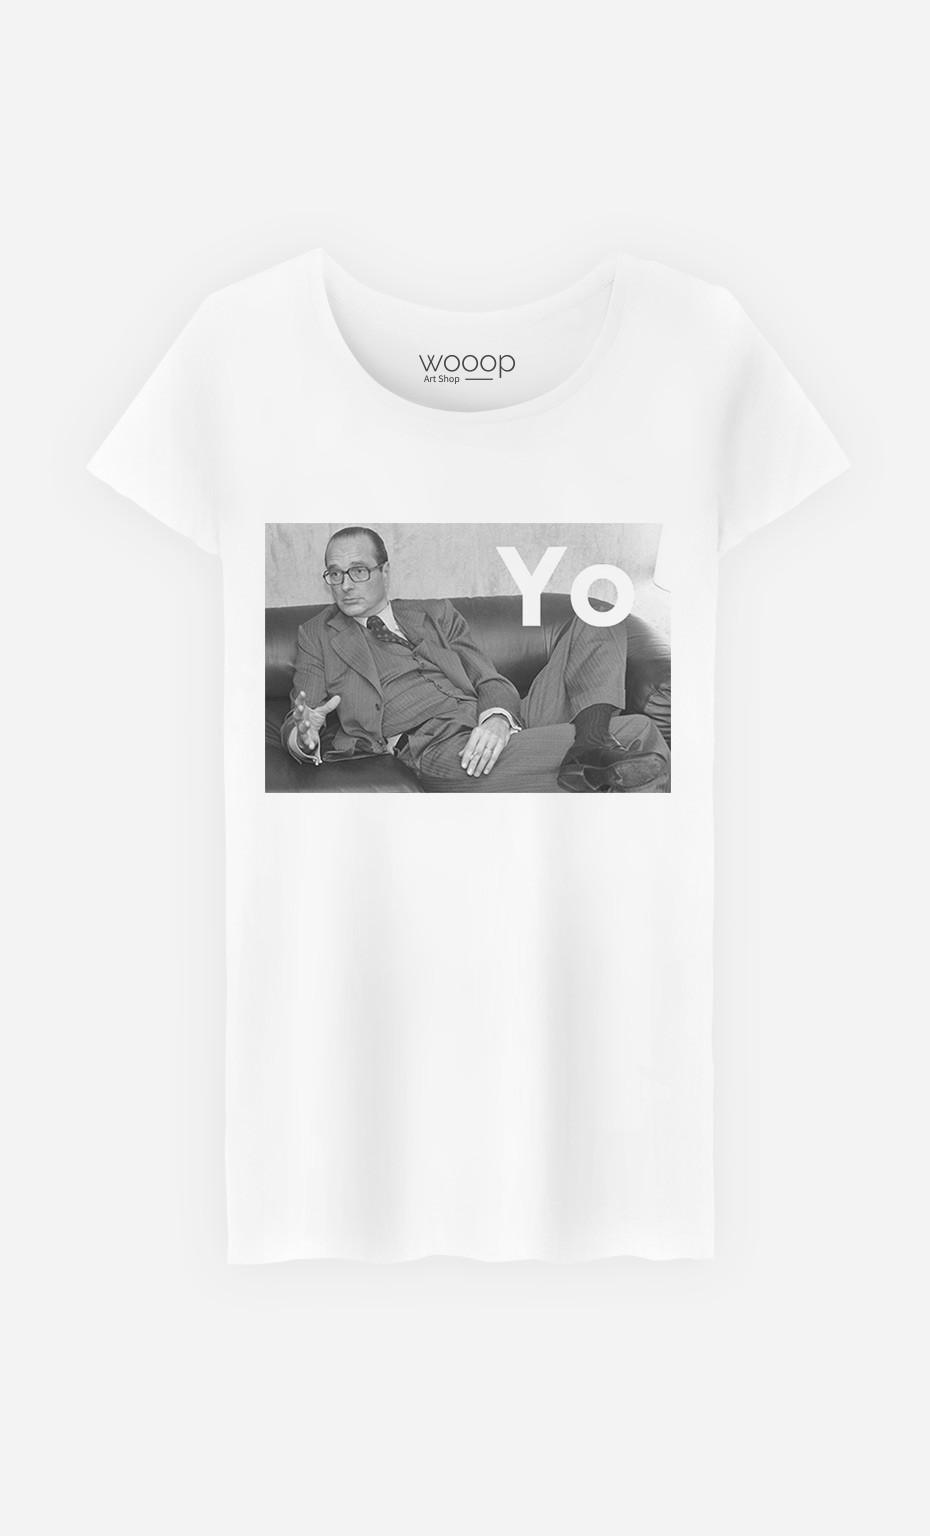 Yo Chirac Original Femme Shirt T RqAL345j